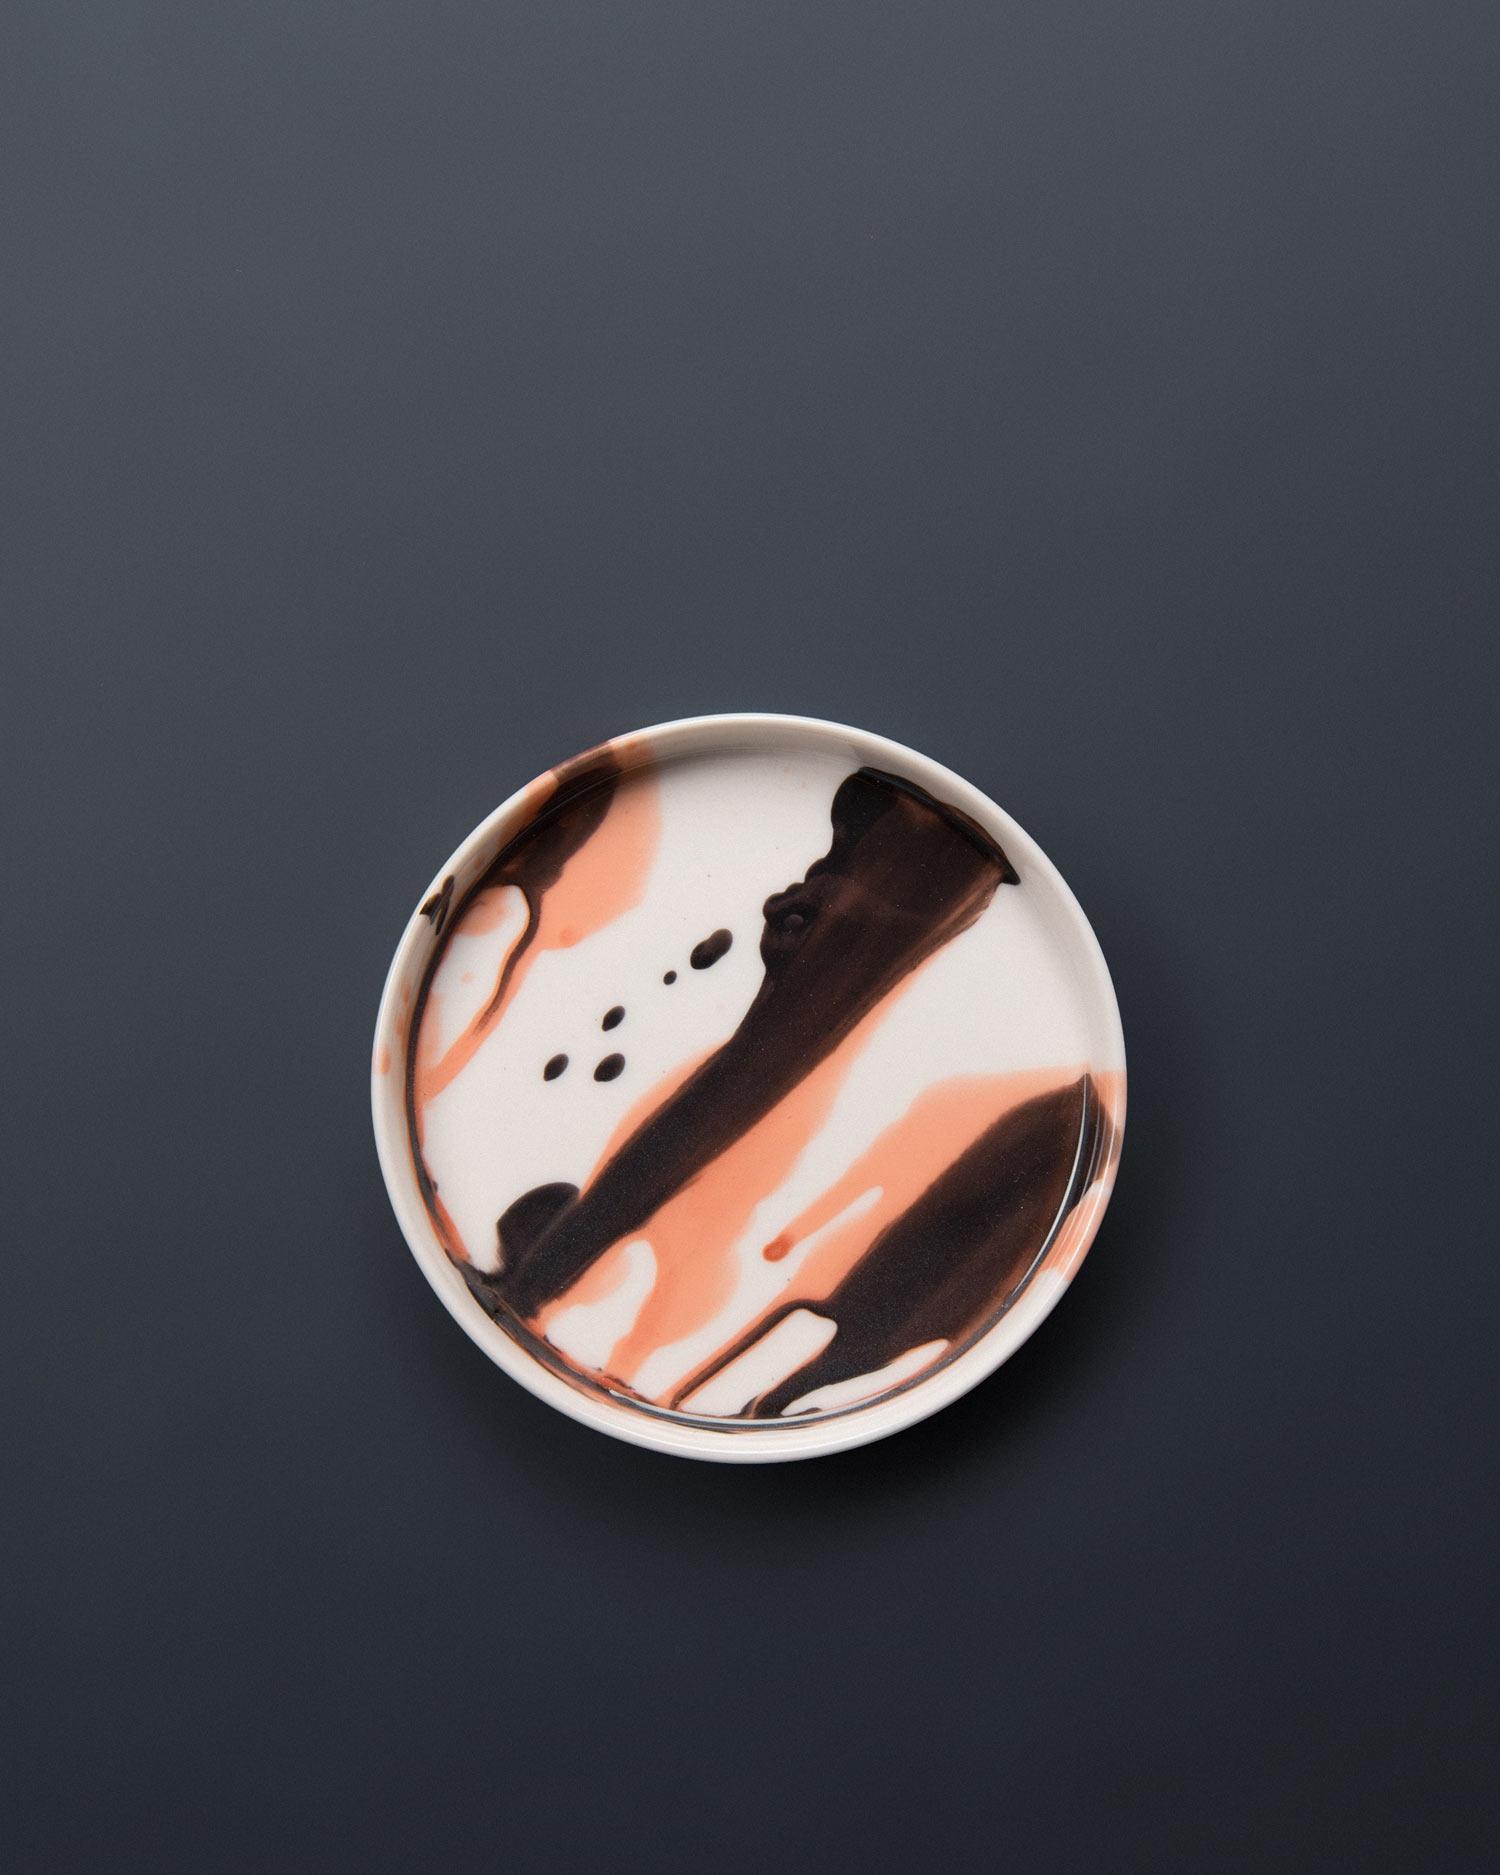 kerfuffle-plates-5.jpg